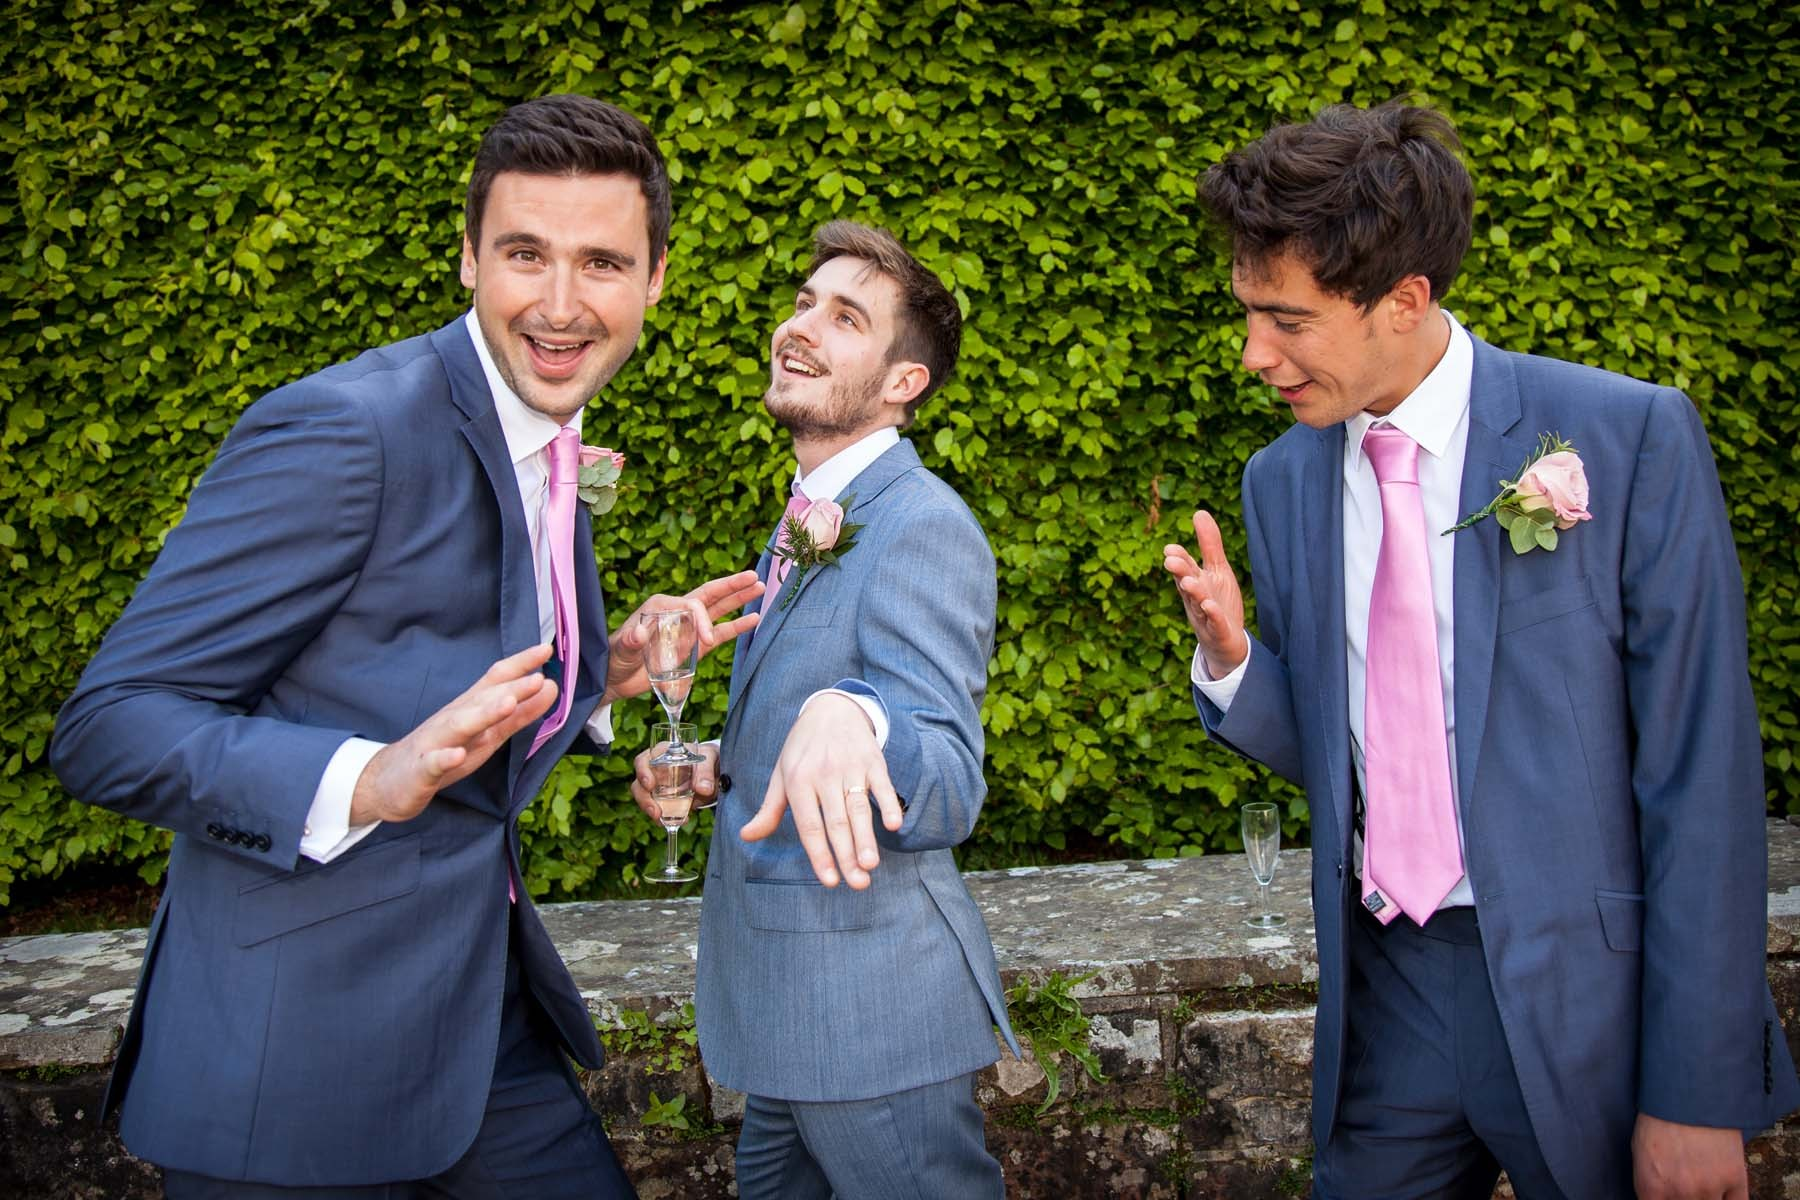 Sussex & Surrey Wedding Photographer - Guests & Groups (4)